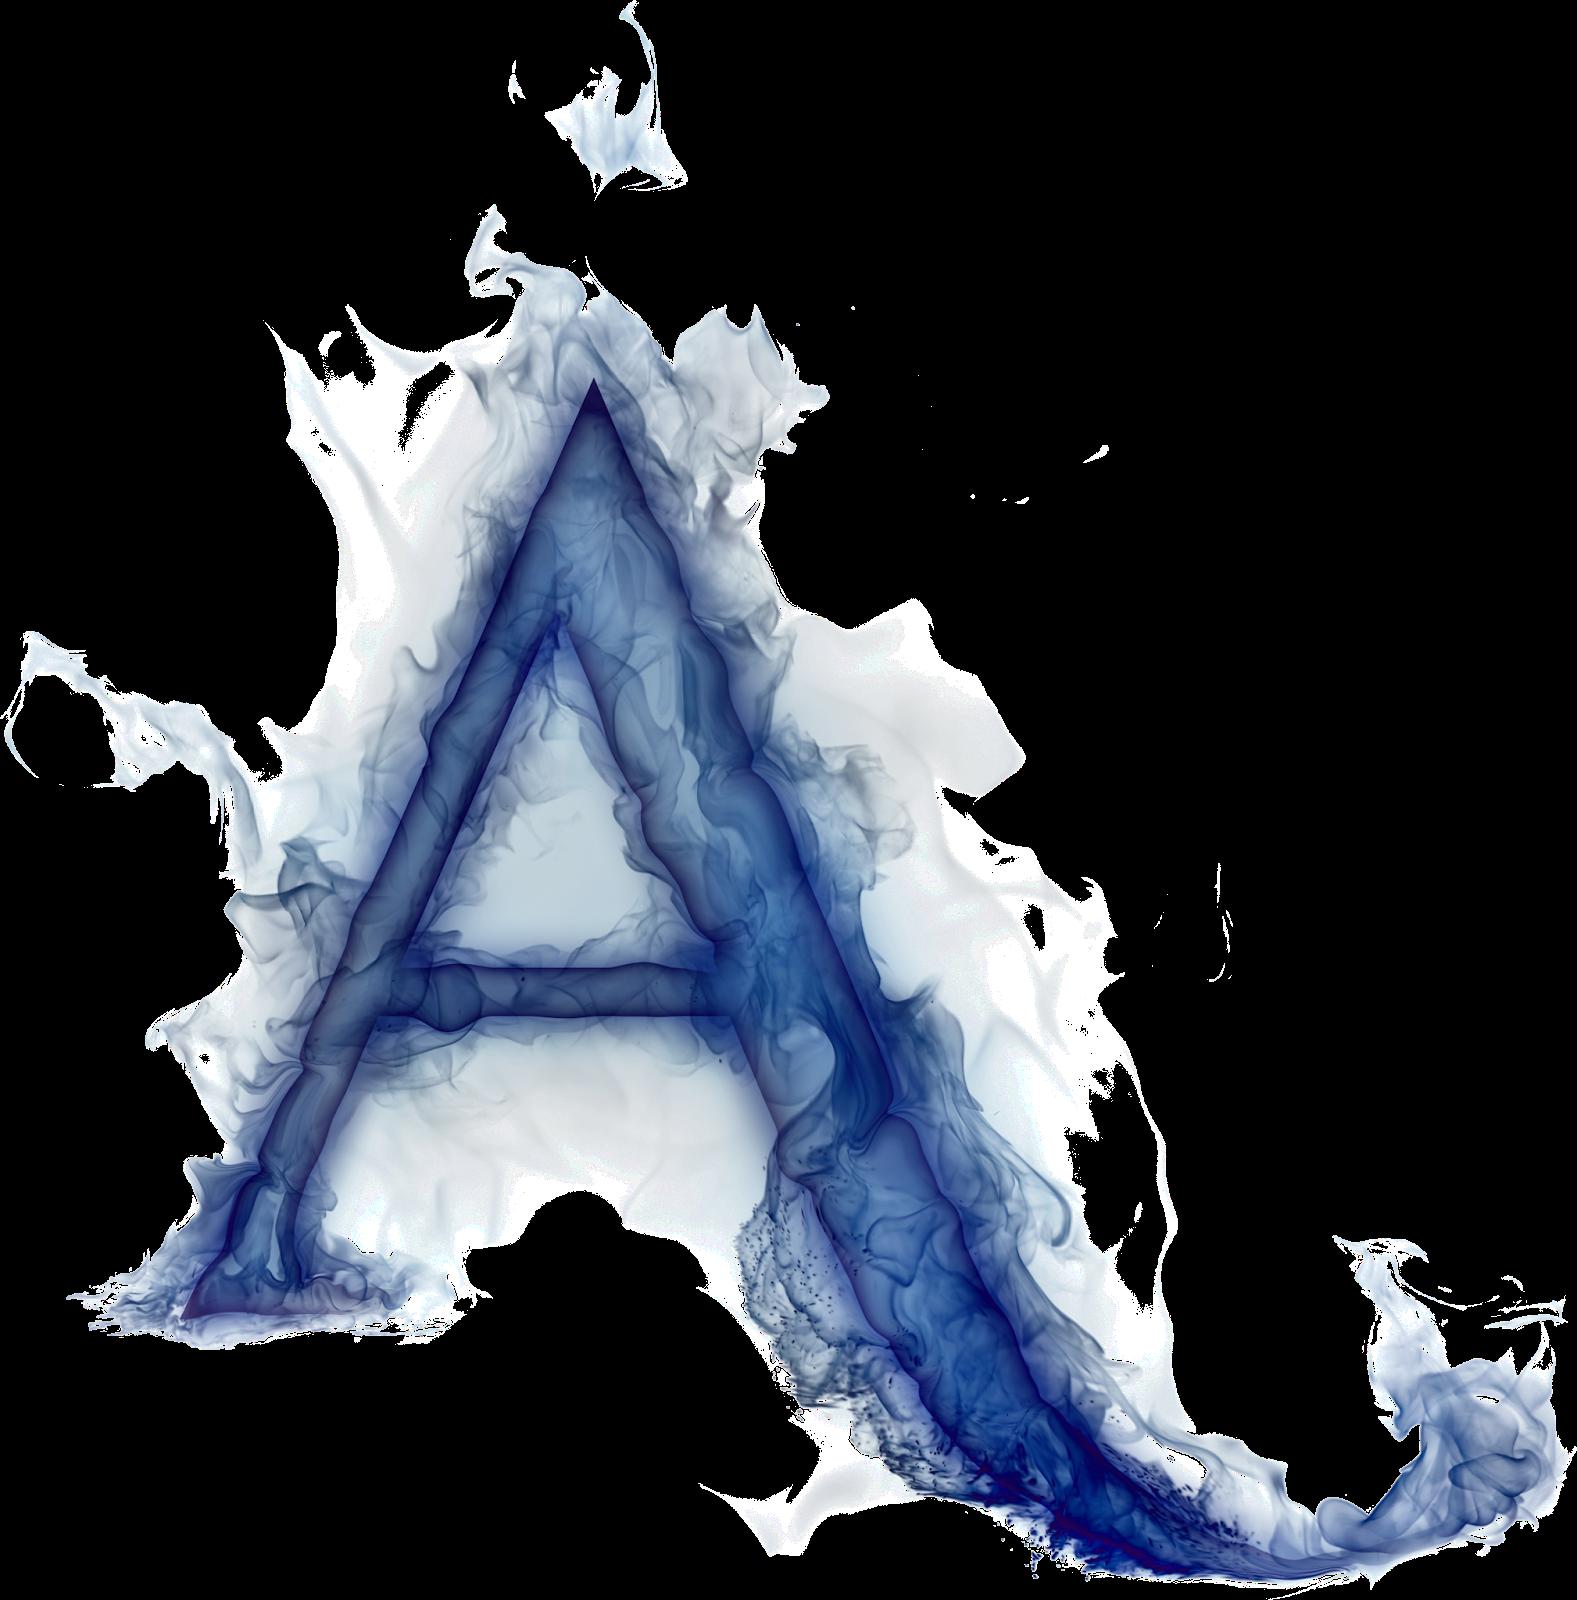 Letter A PNG Transparent Image.